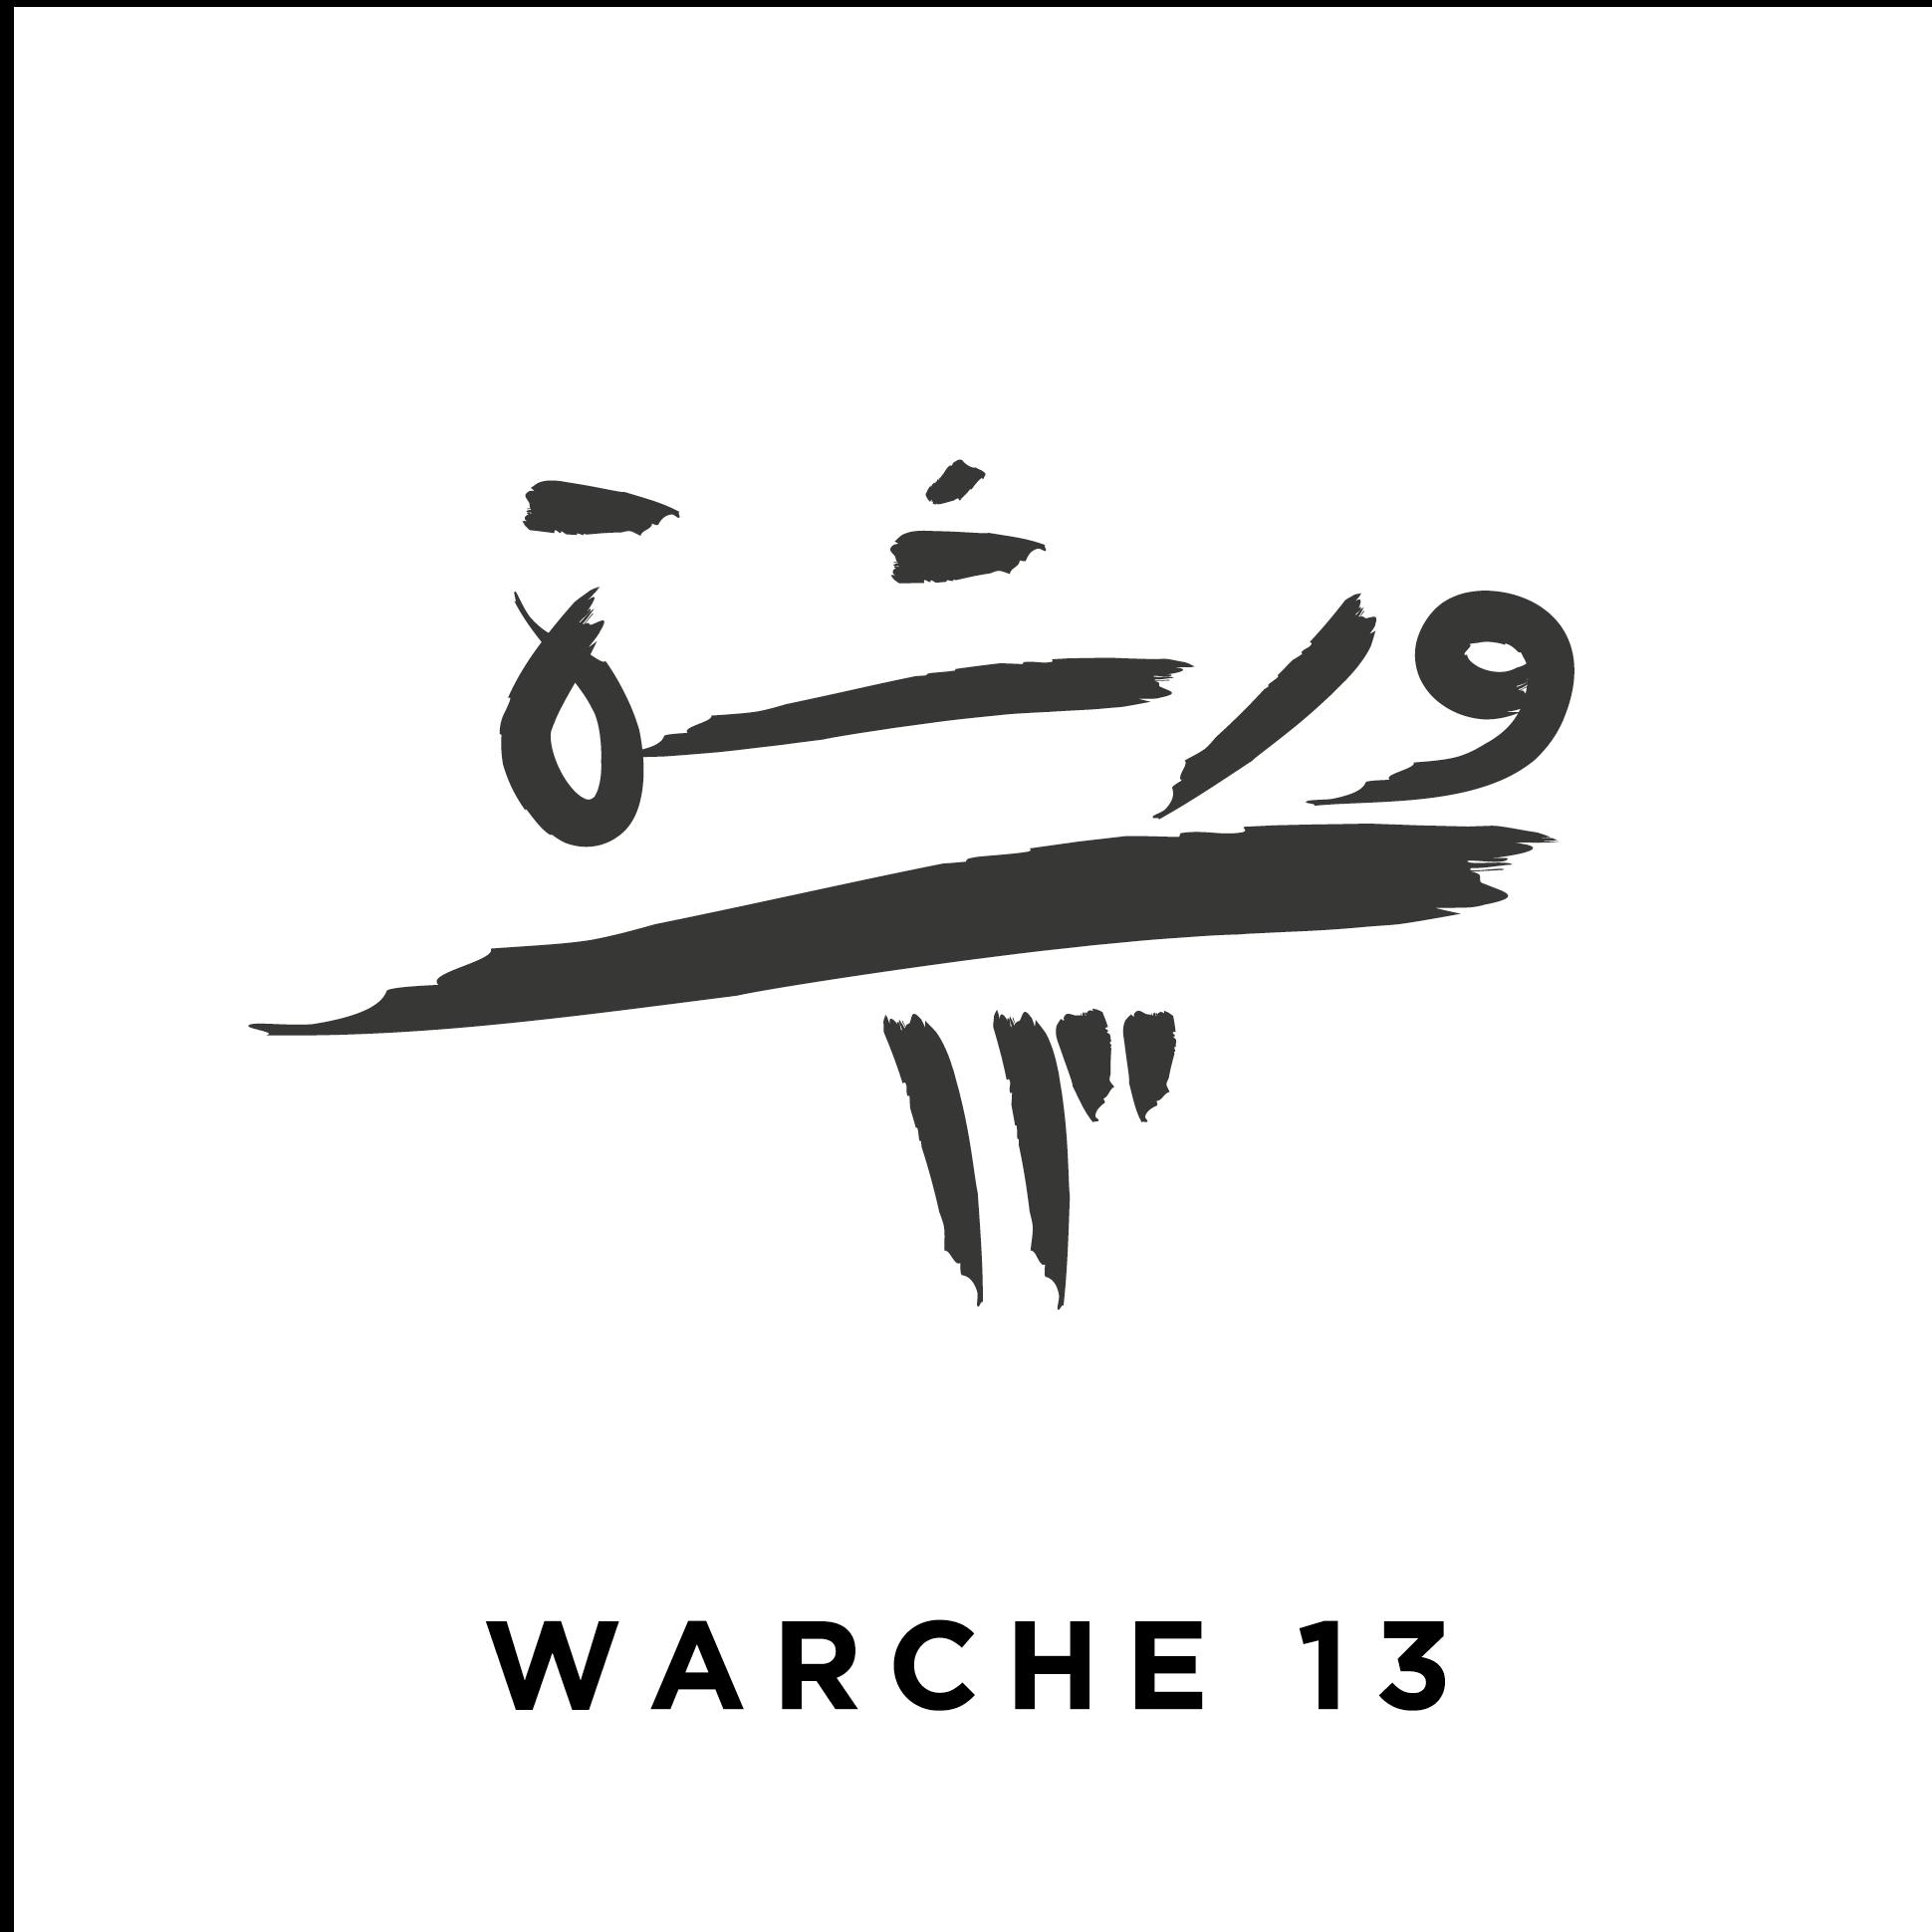 Warche 13